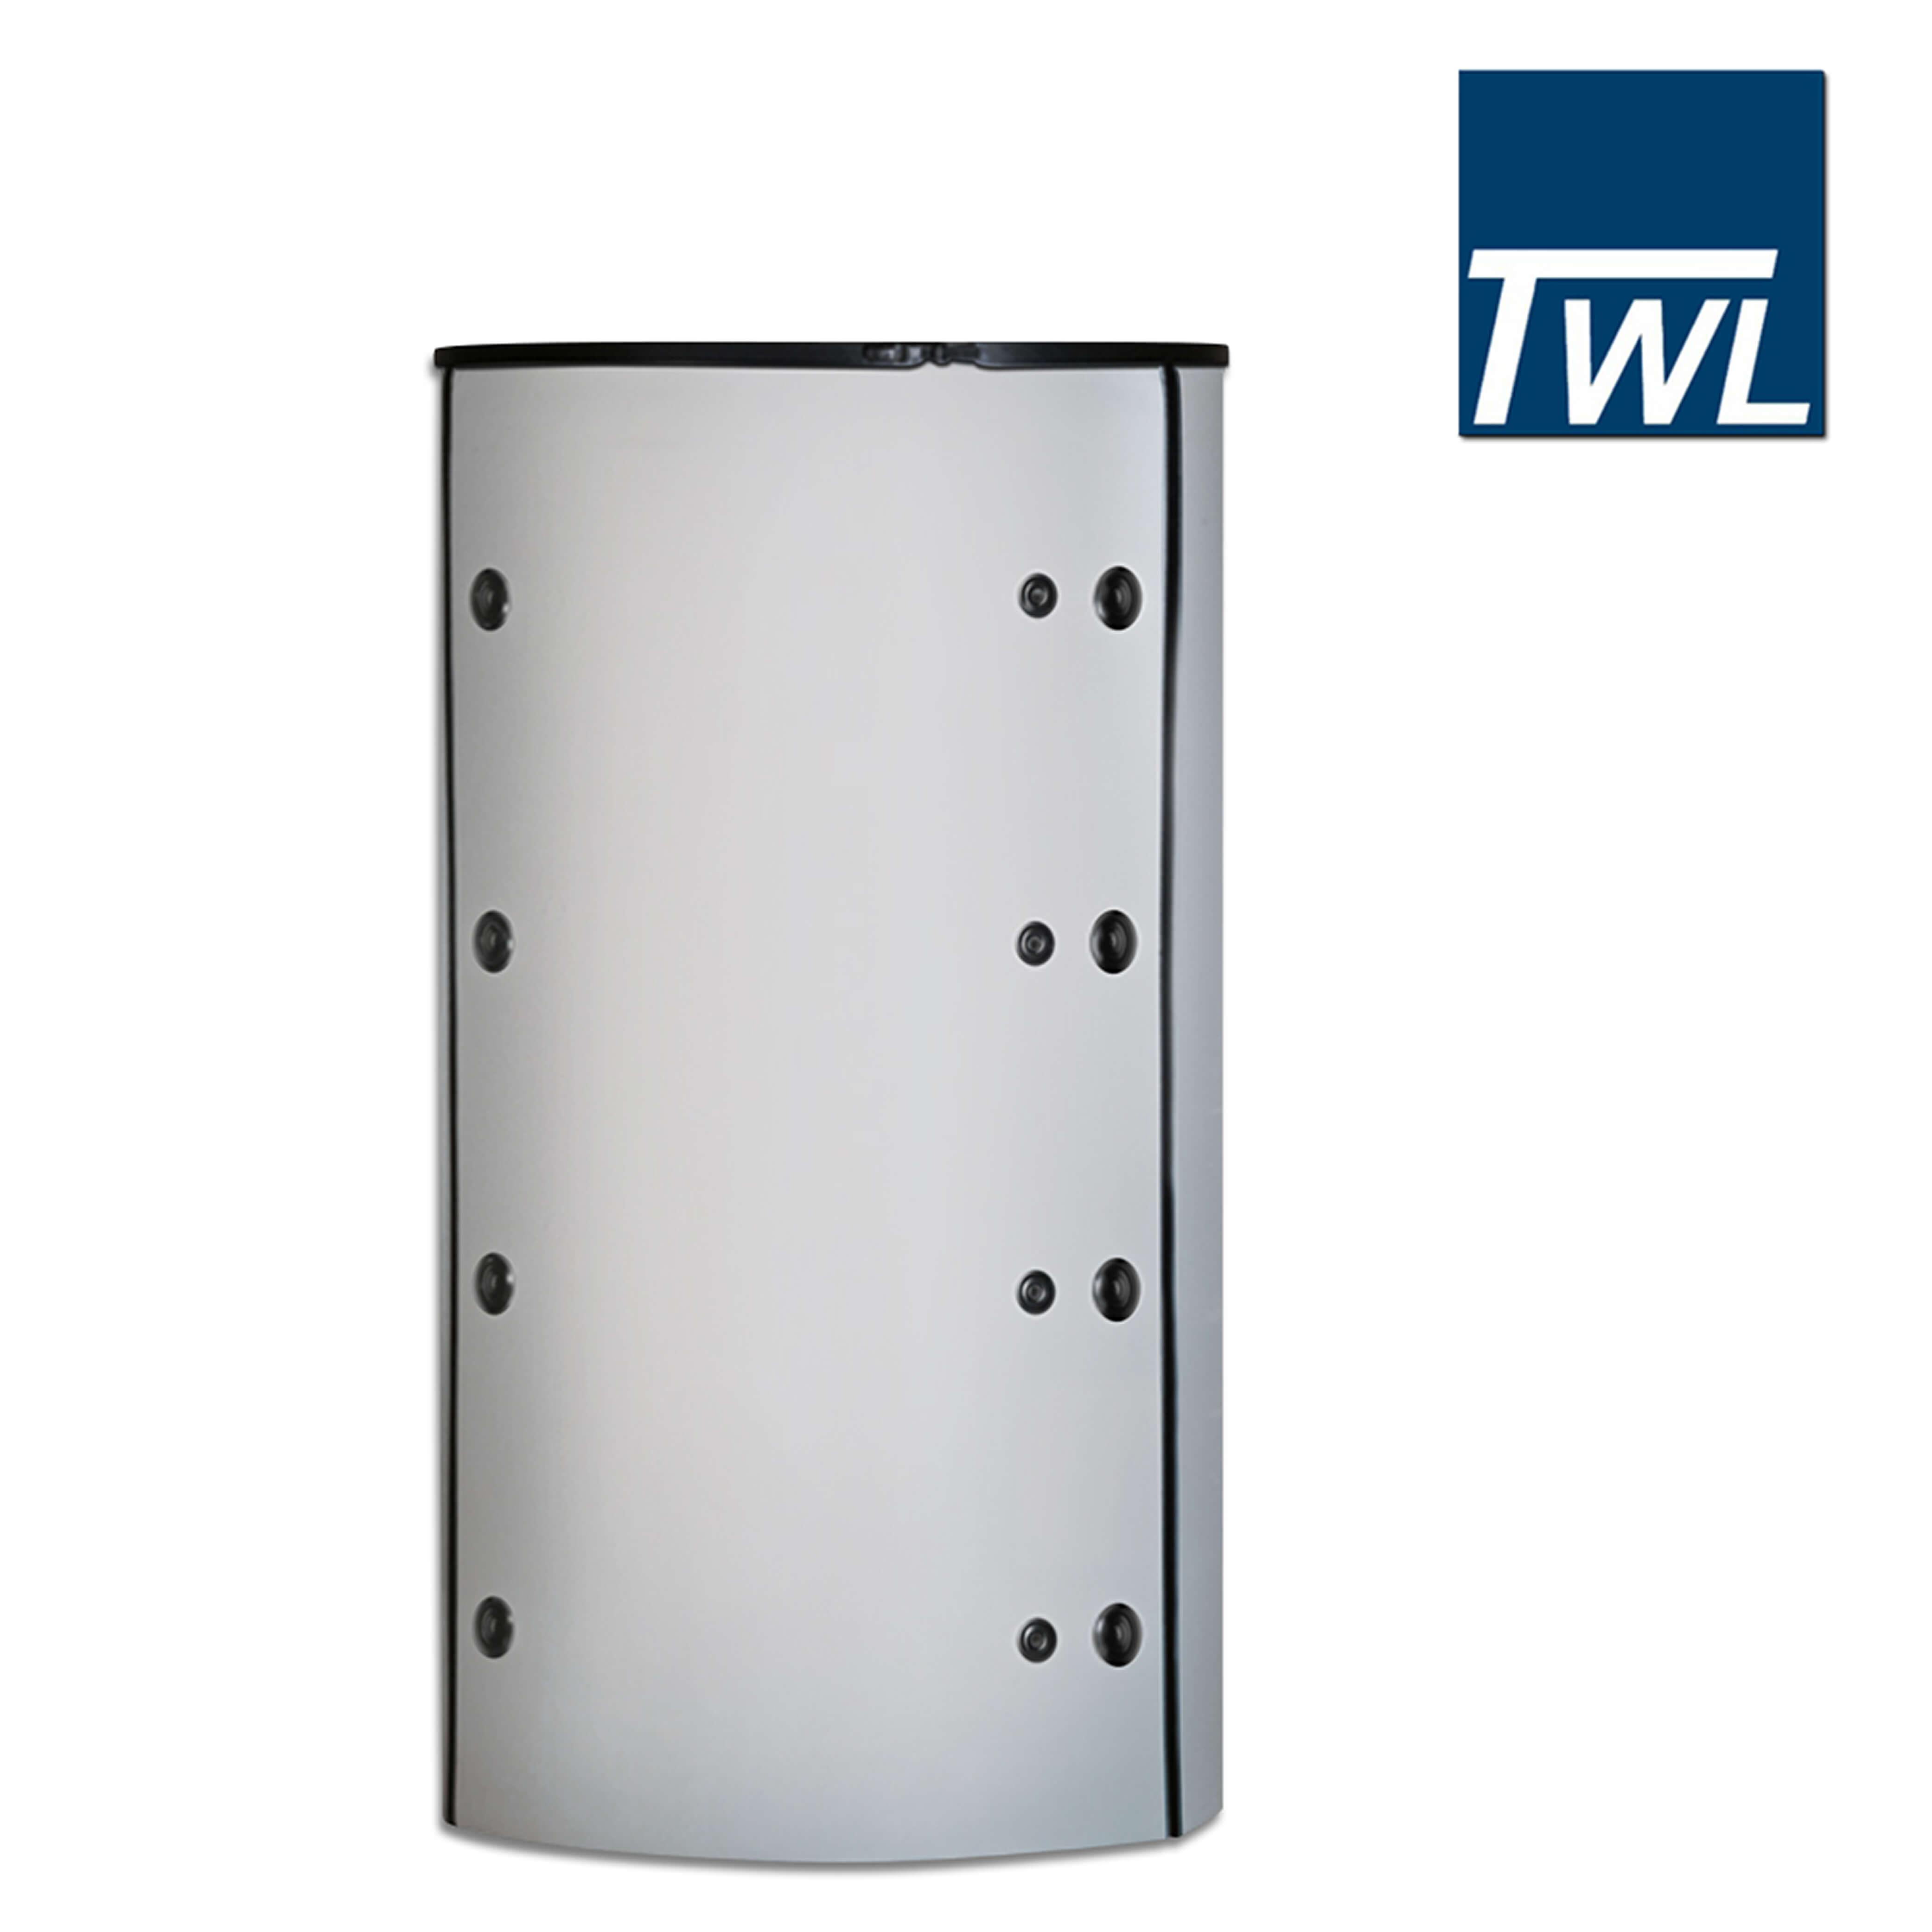 5000 liter twl puffer pufferspeicher typ p 5000 iso b. Black Bedroom Furniture Sets. Home Design Ideas